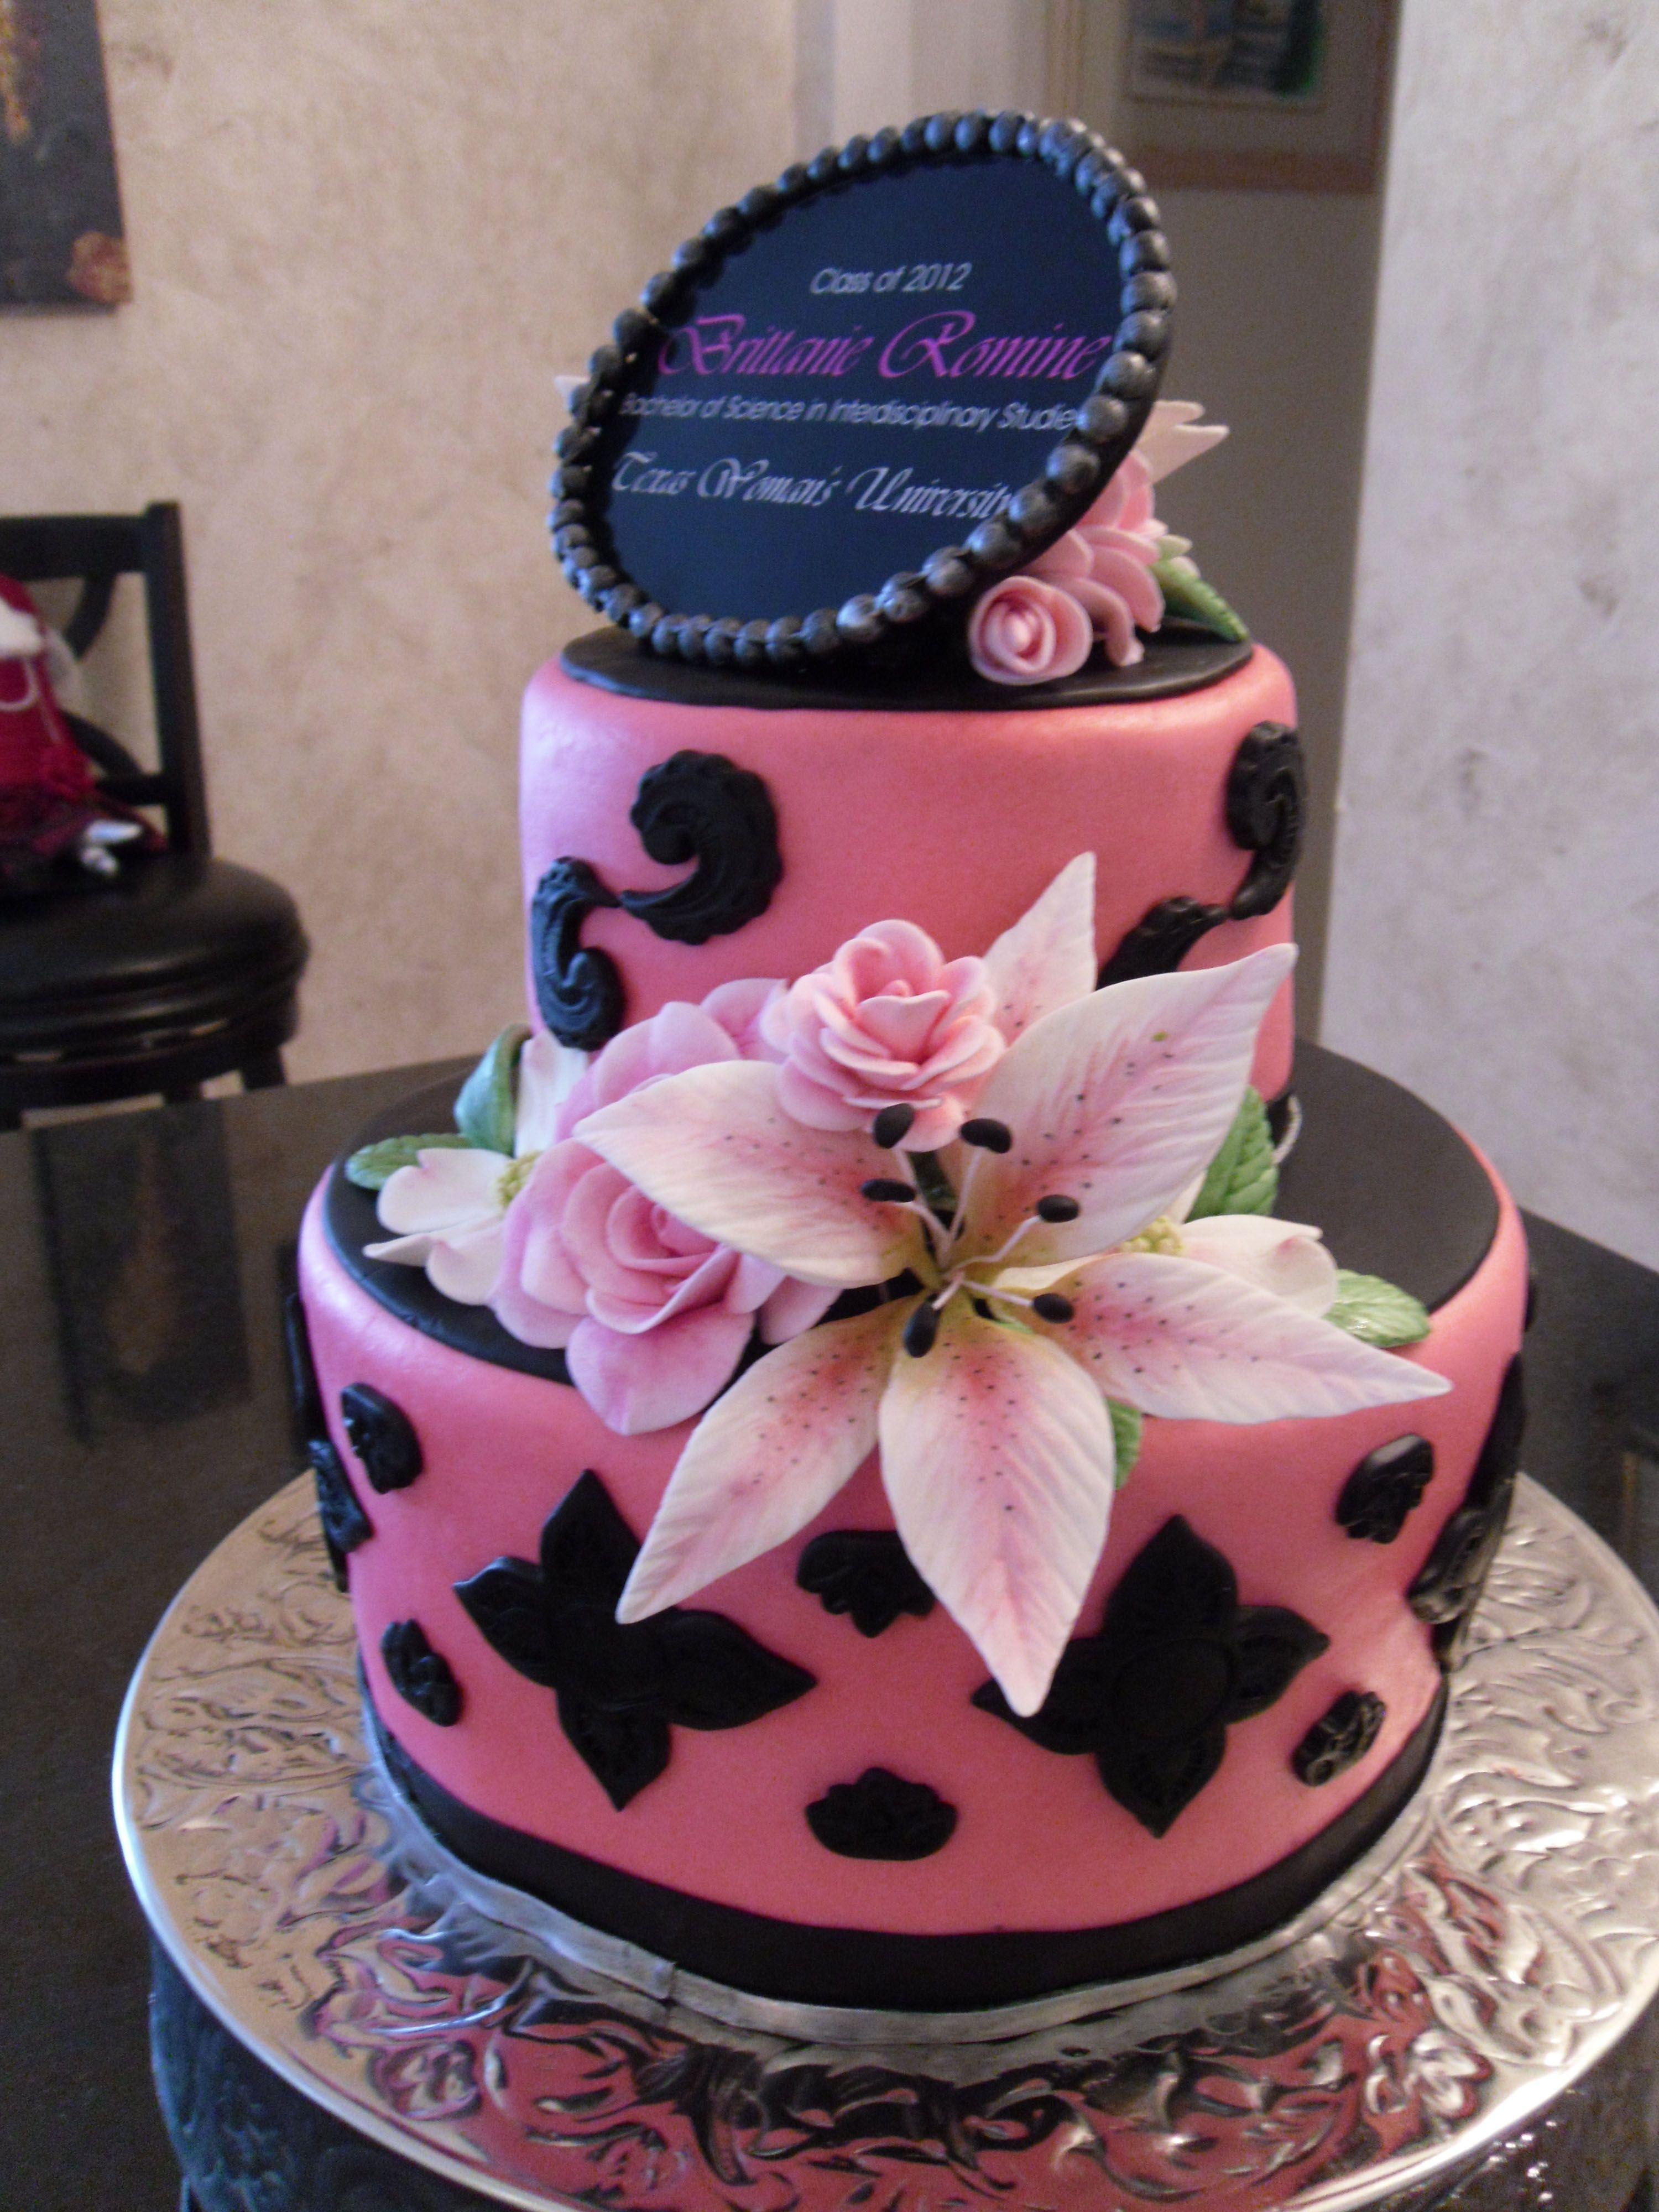 Decorating Ideas > Graduation Cake  My Fondant Cake Designs  Pinterest ~ 002125_Cake Design Ideas For Graduation